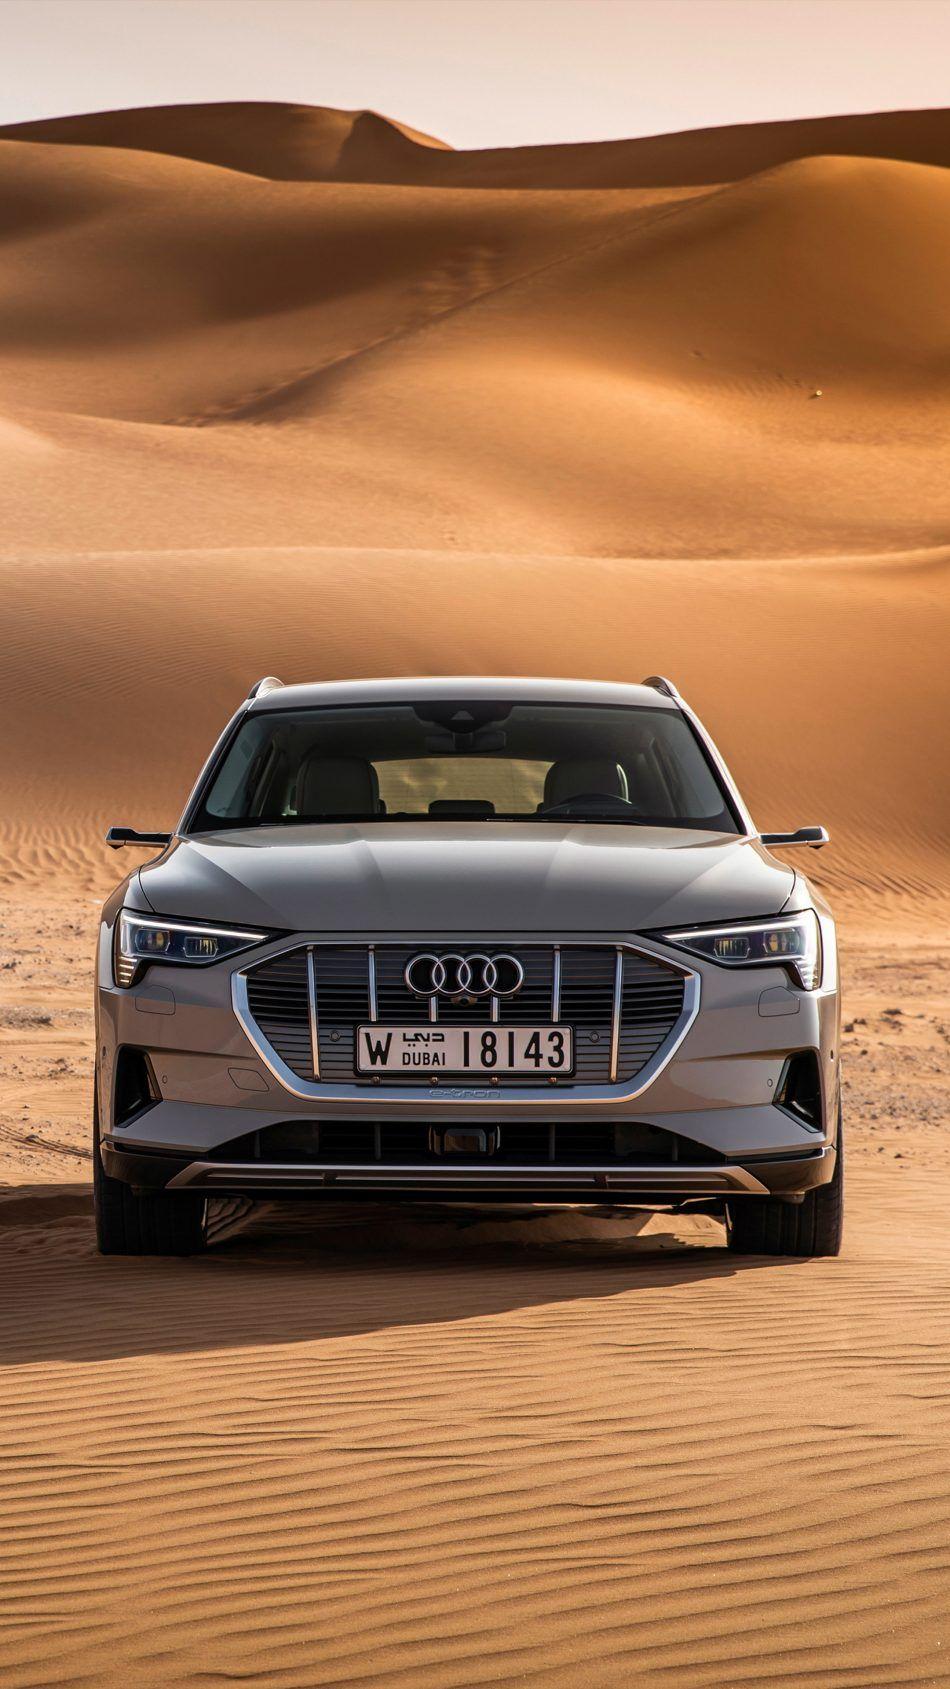 Audi E Tron 55 Quattro Dubai Desert Free 4K Ultra HD Mobile Wallpaper